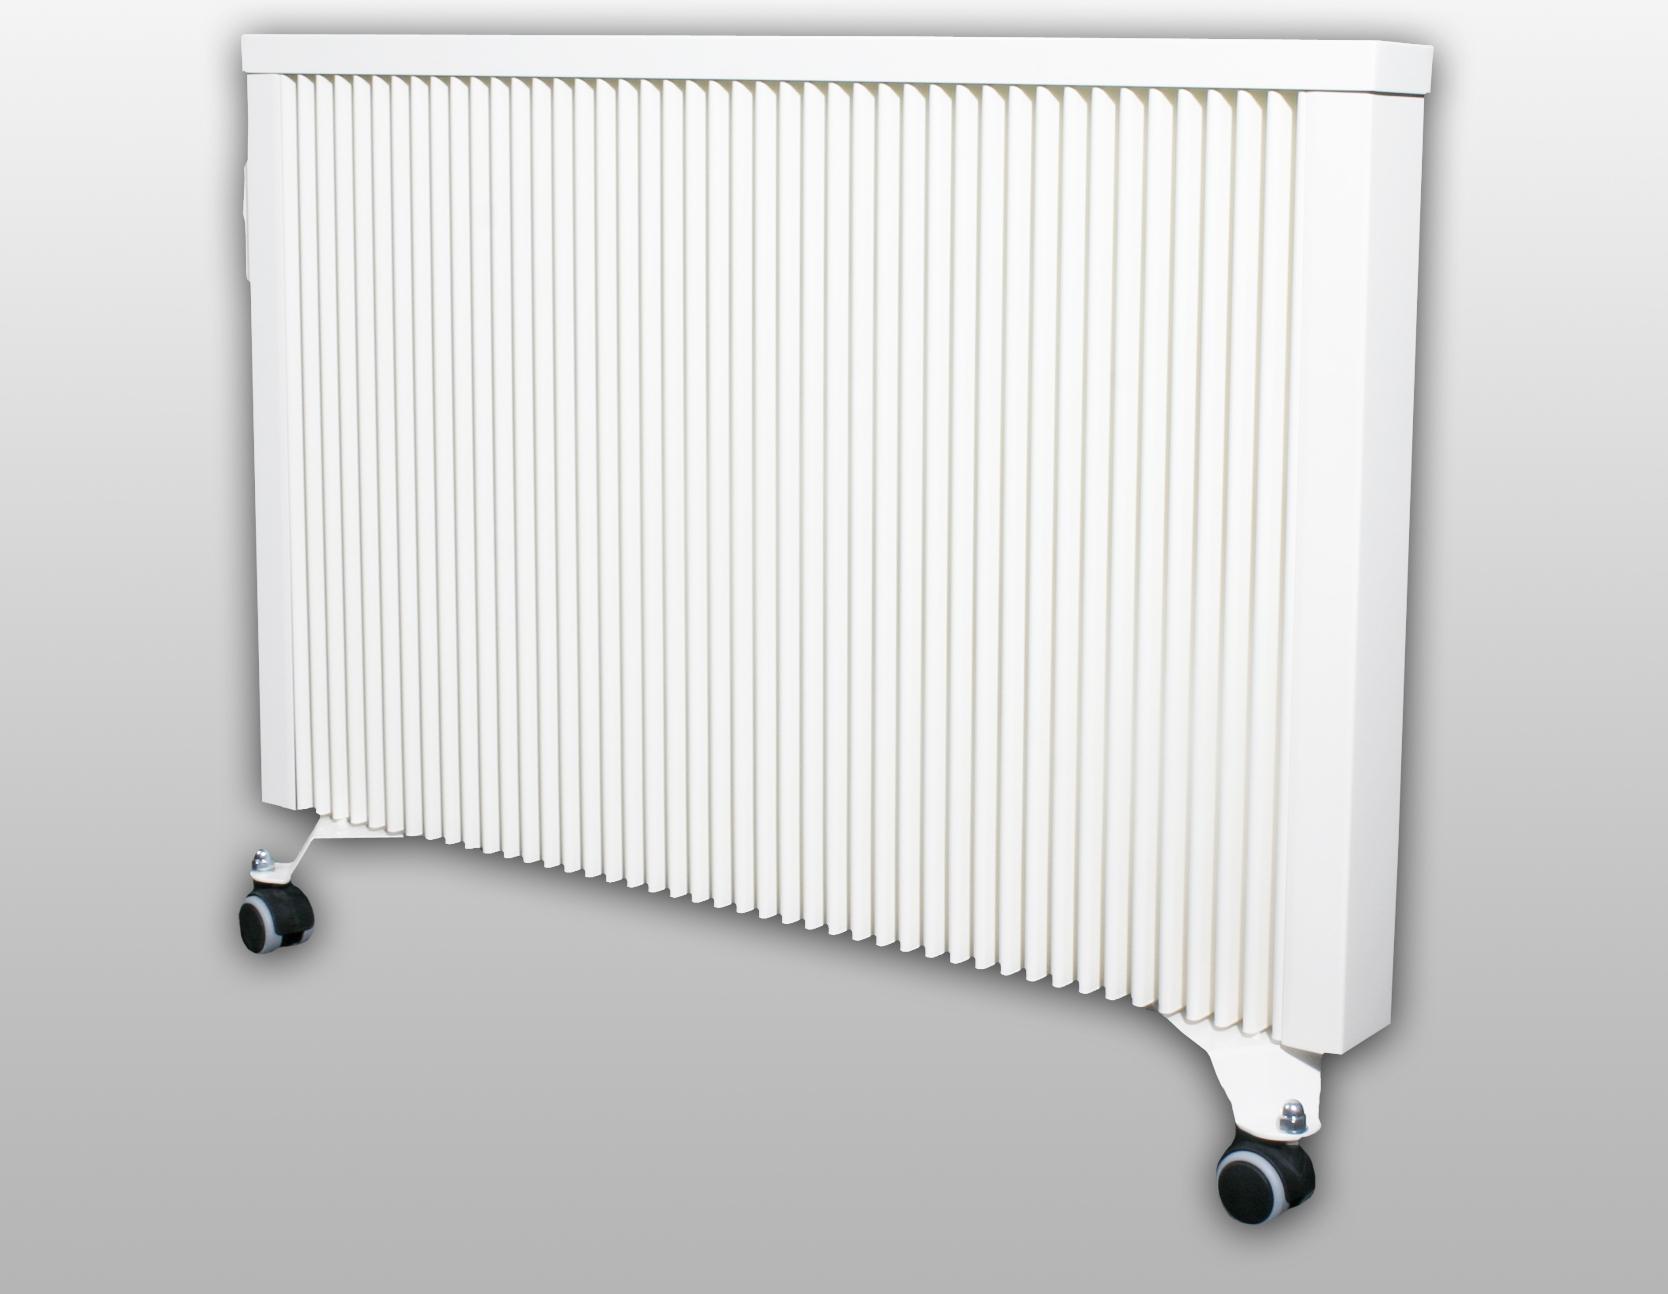 Topný panel série H,TYP H75, 750 W